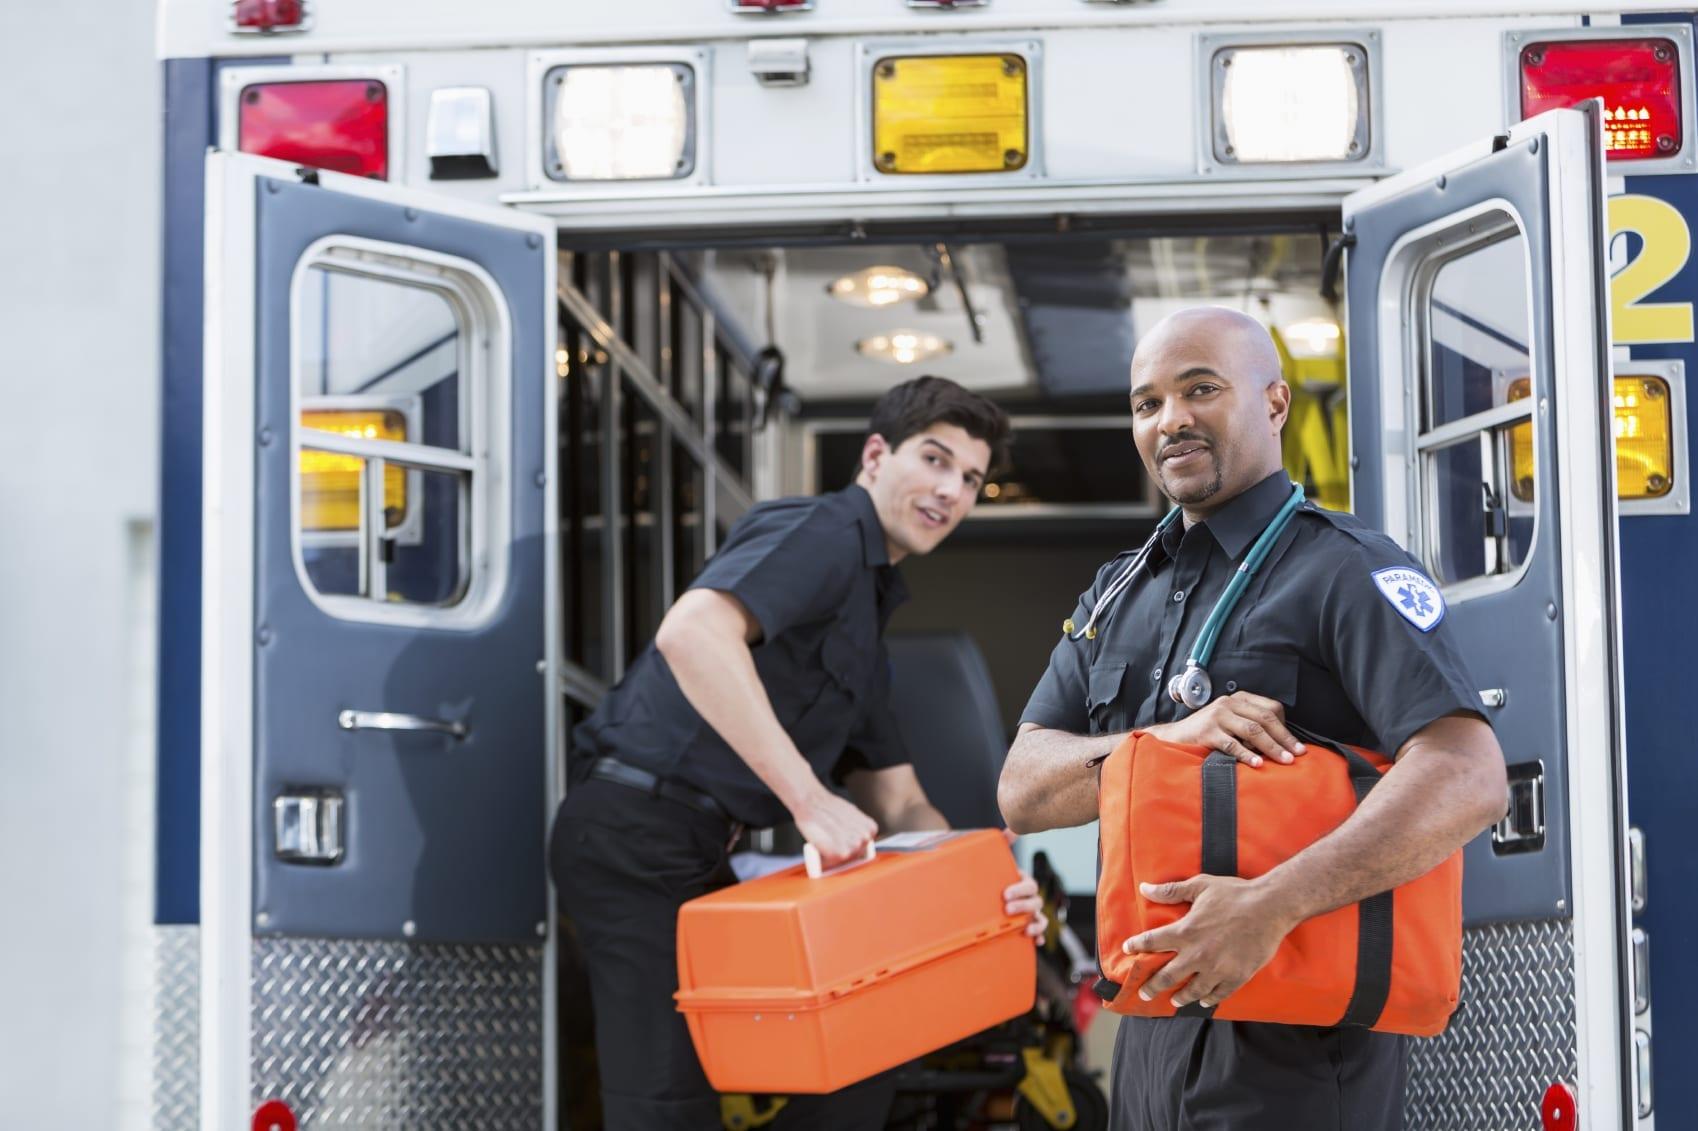 Paramedics Loading An Ambulance With Supplies Stock Photo